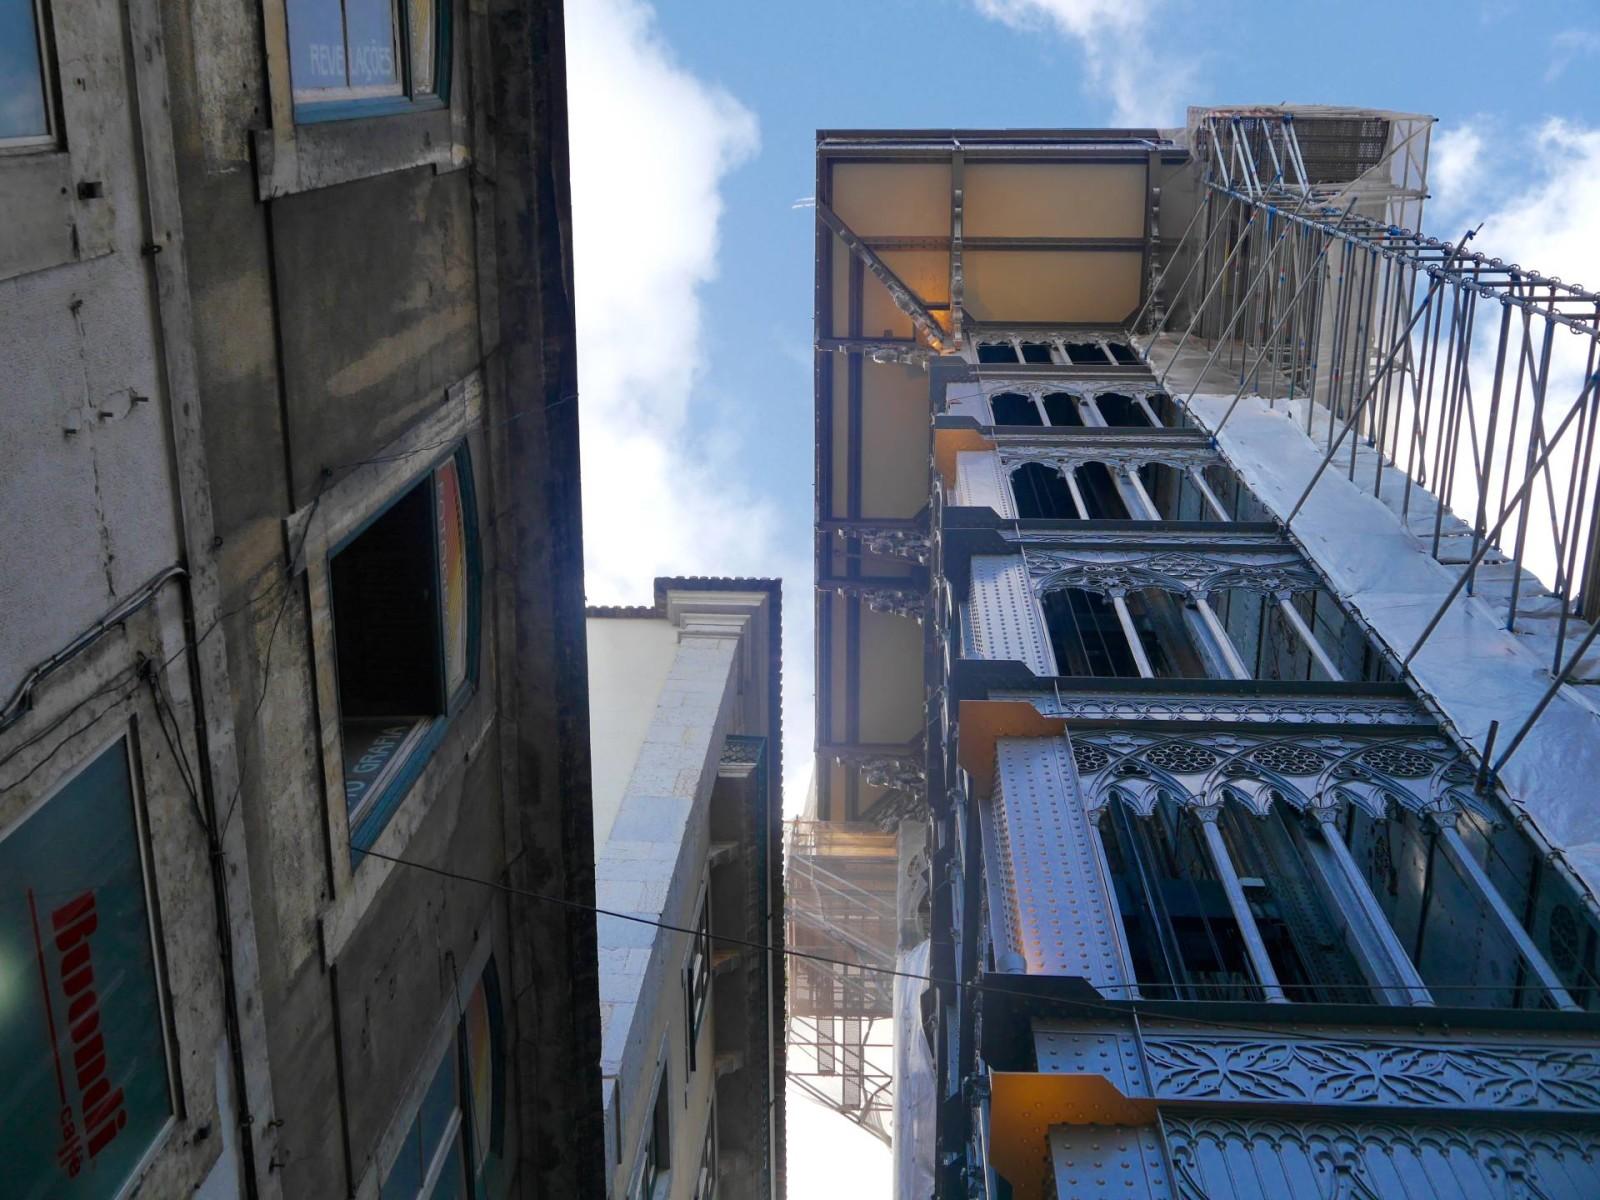 elevador-santa-justa-lisbon